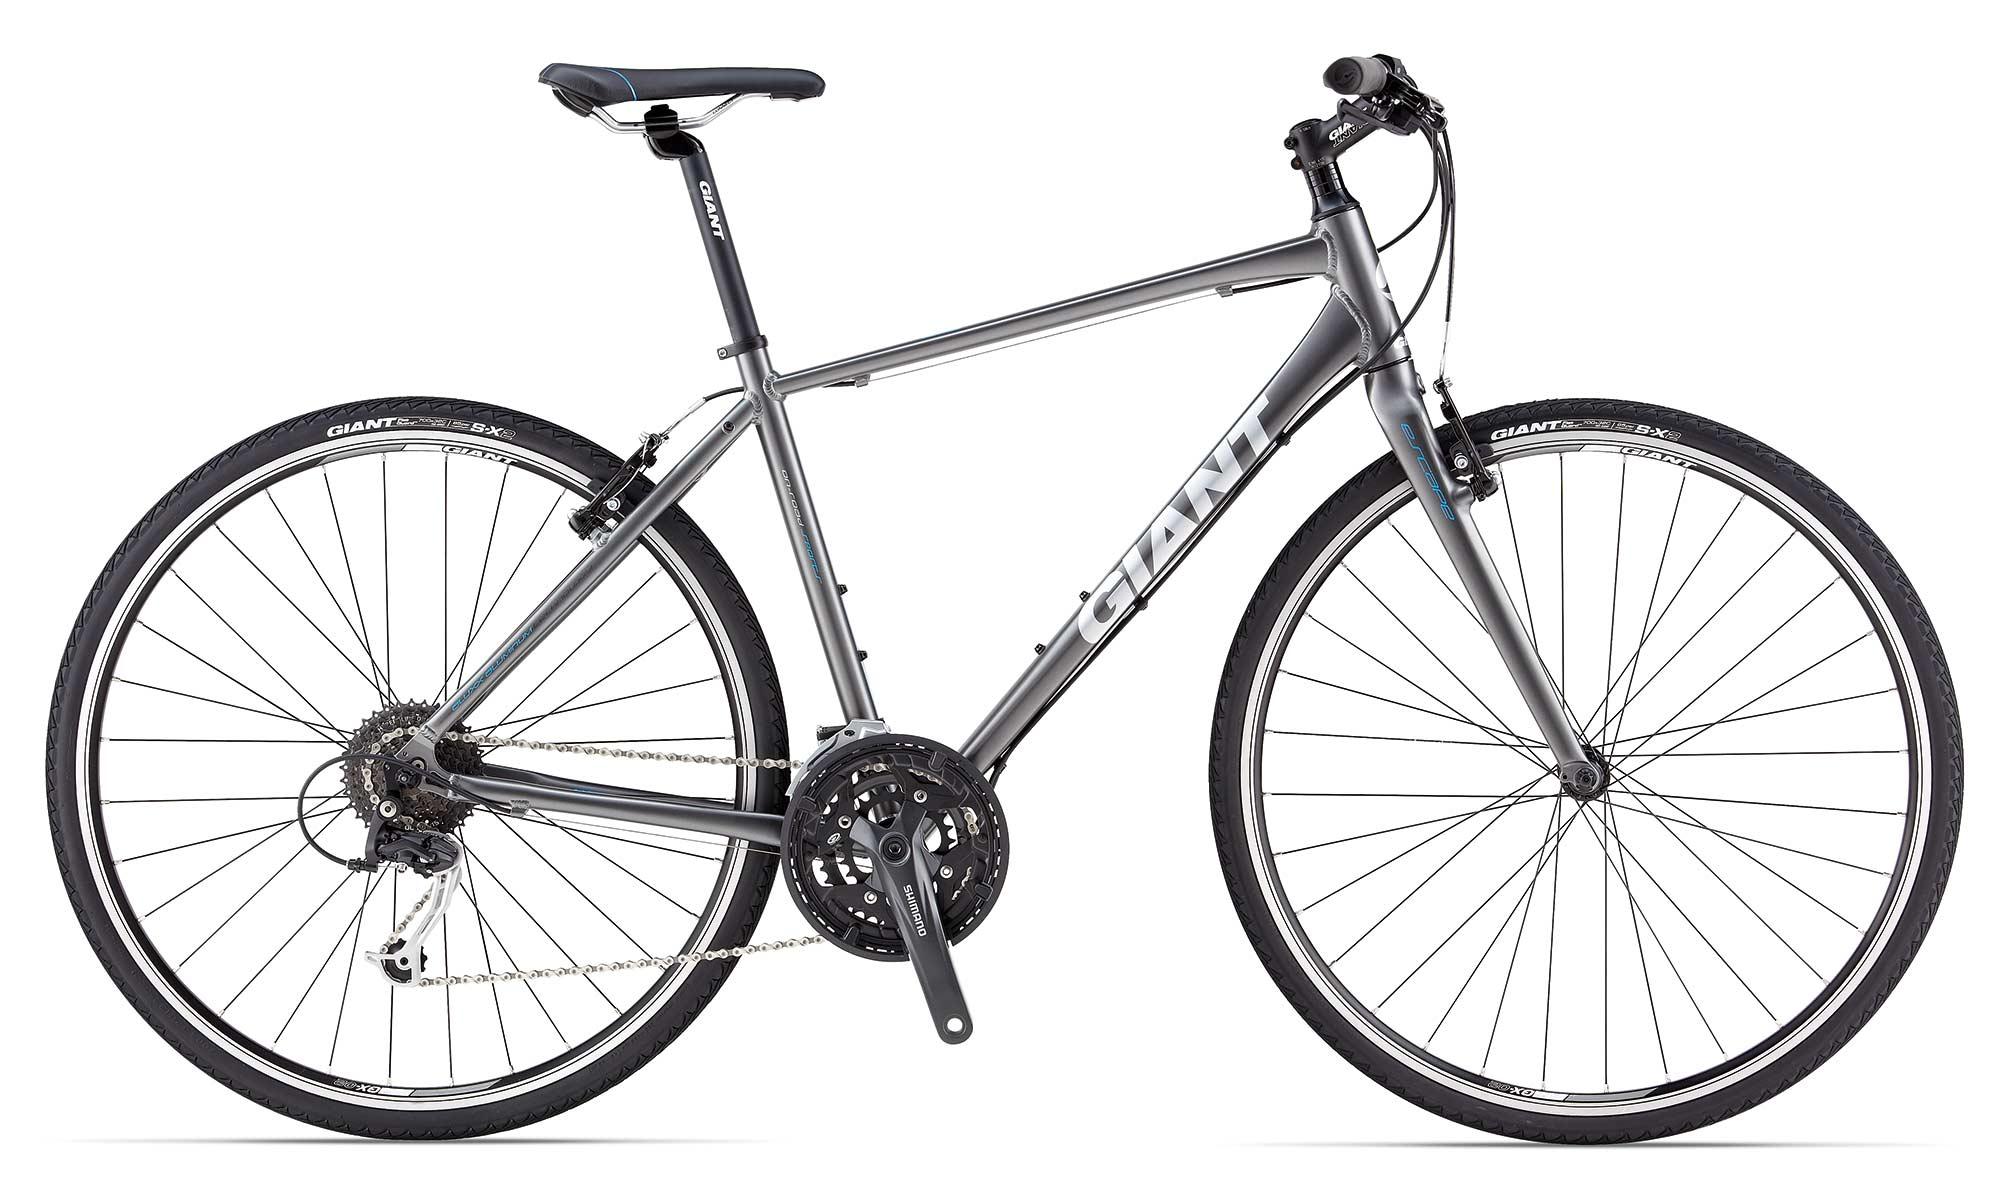 Northcutt Bikes Case Answers